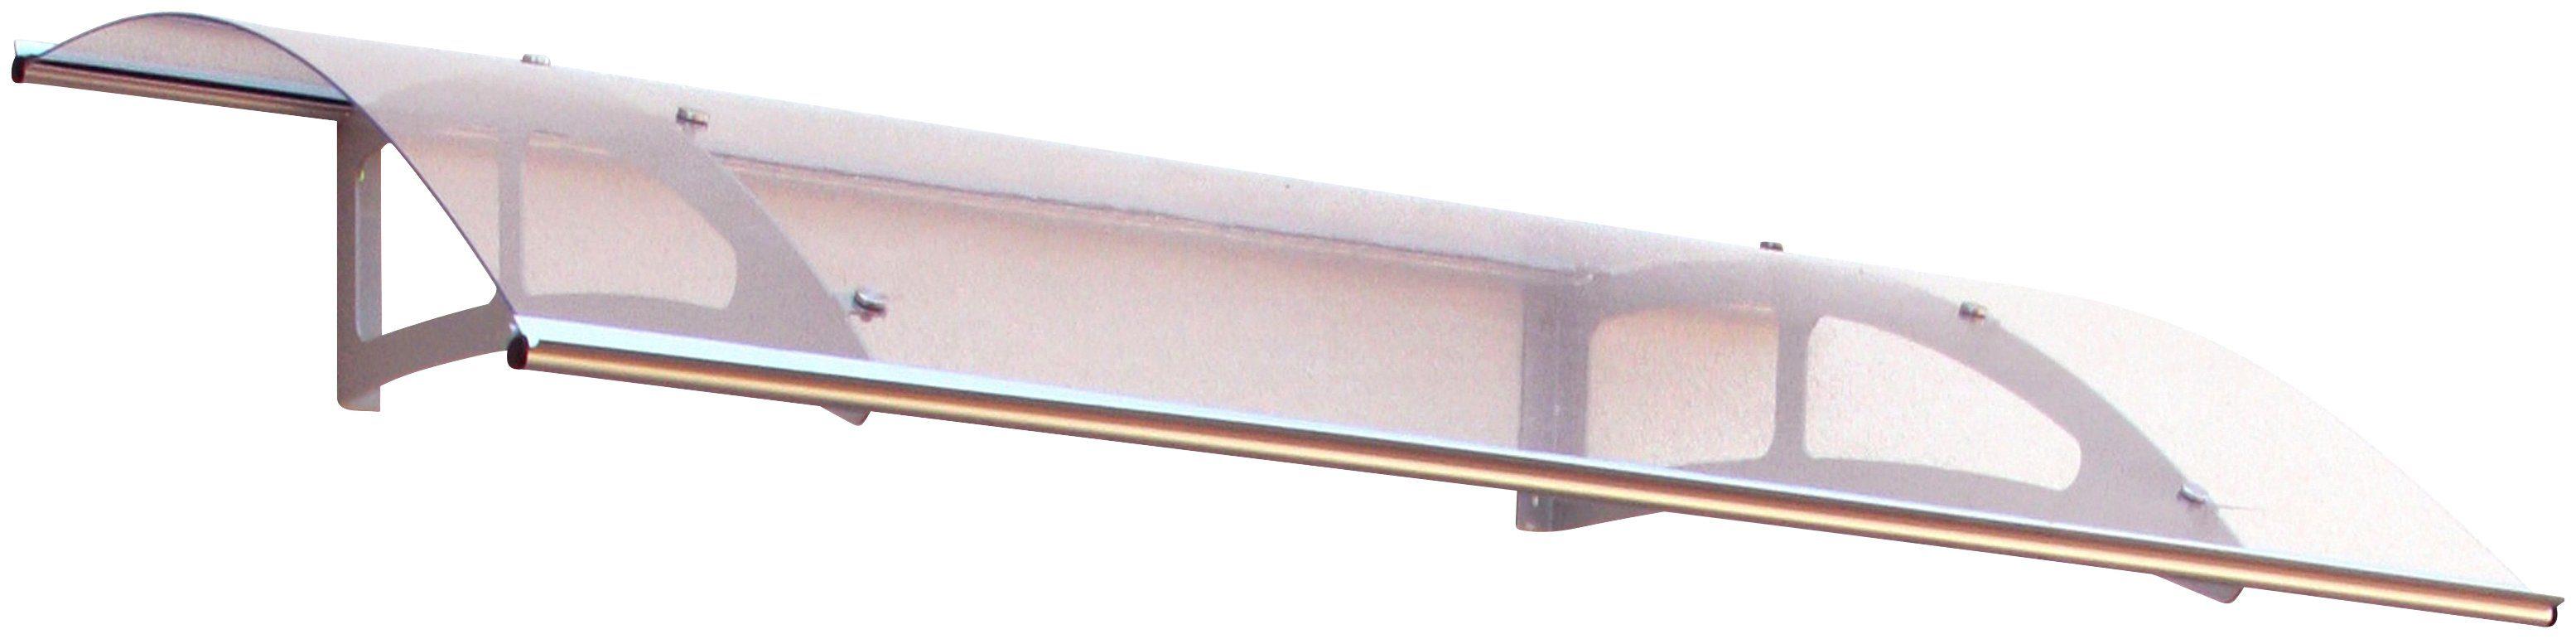 SUPERROOF Pultvordach »MARIA«, BxT: 150x92,5 cm